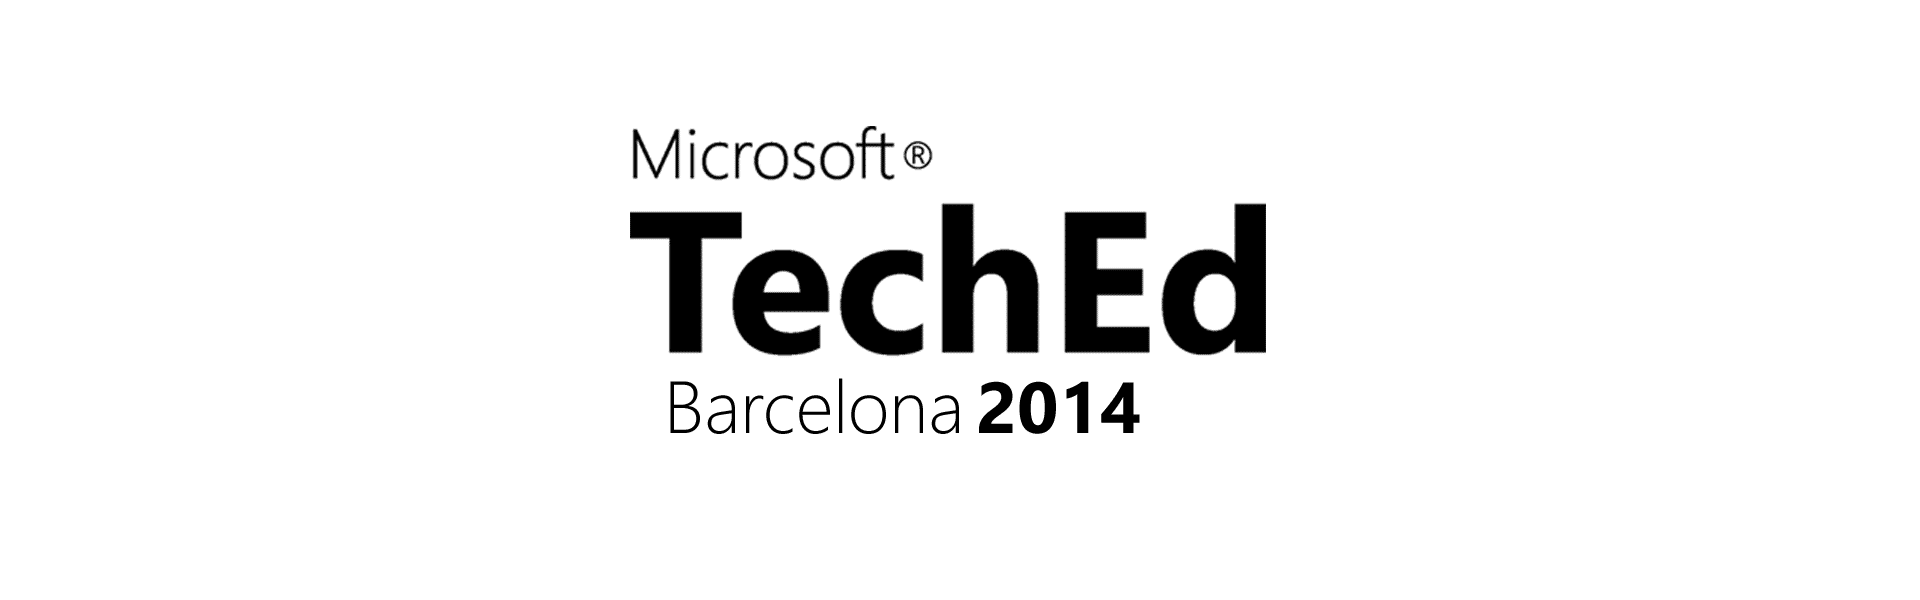 microsoft teched barcelona 2014